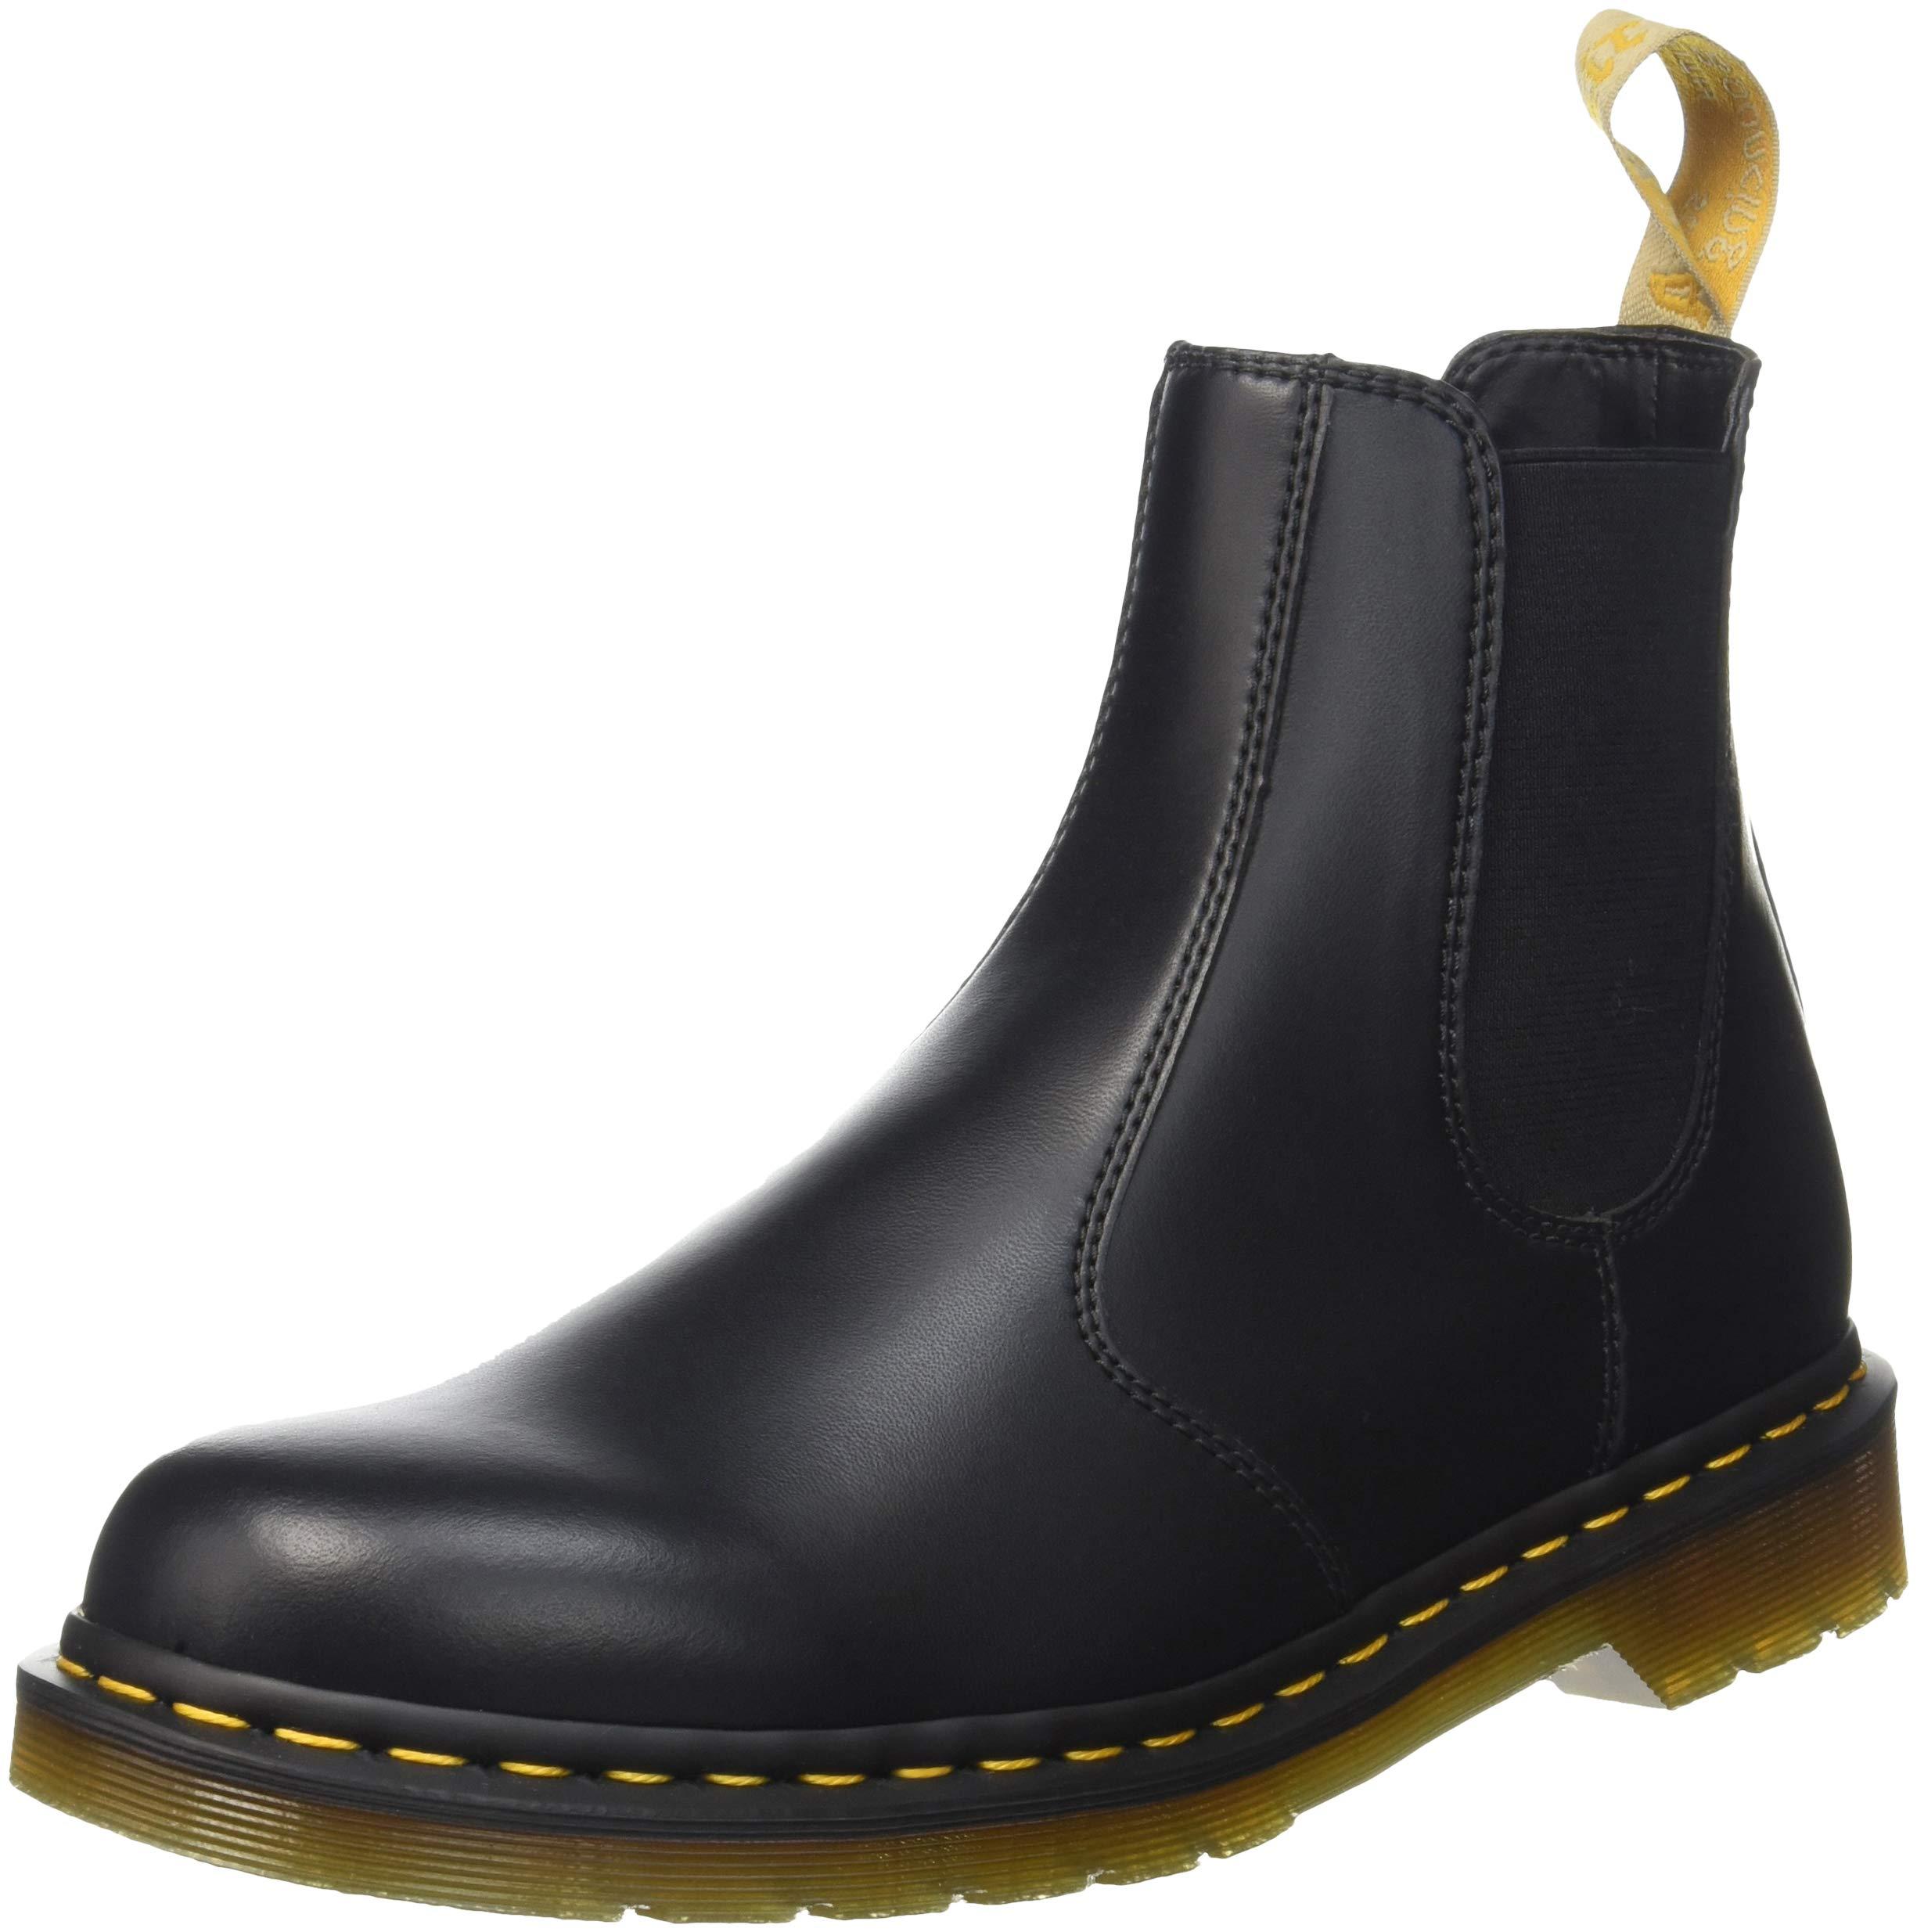 Dr. Martens Men's 2976 Felix Rub Off Chelsea Boot, Black, 3 UK/4 M US